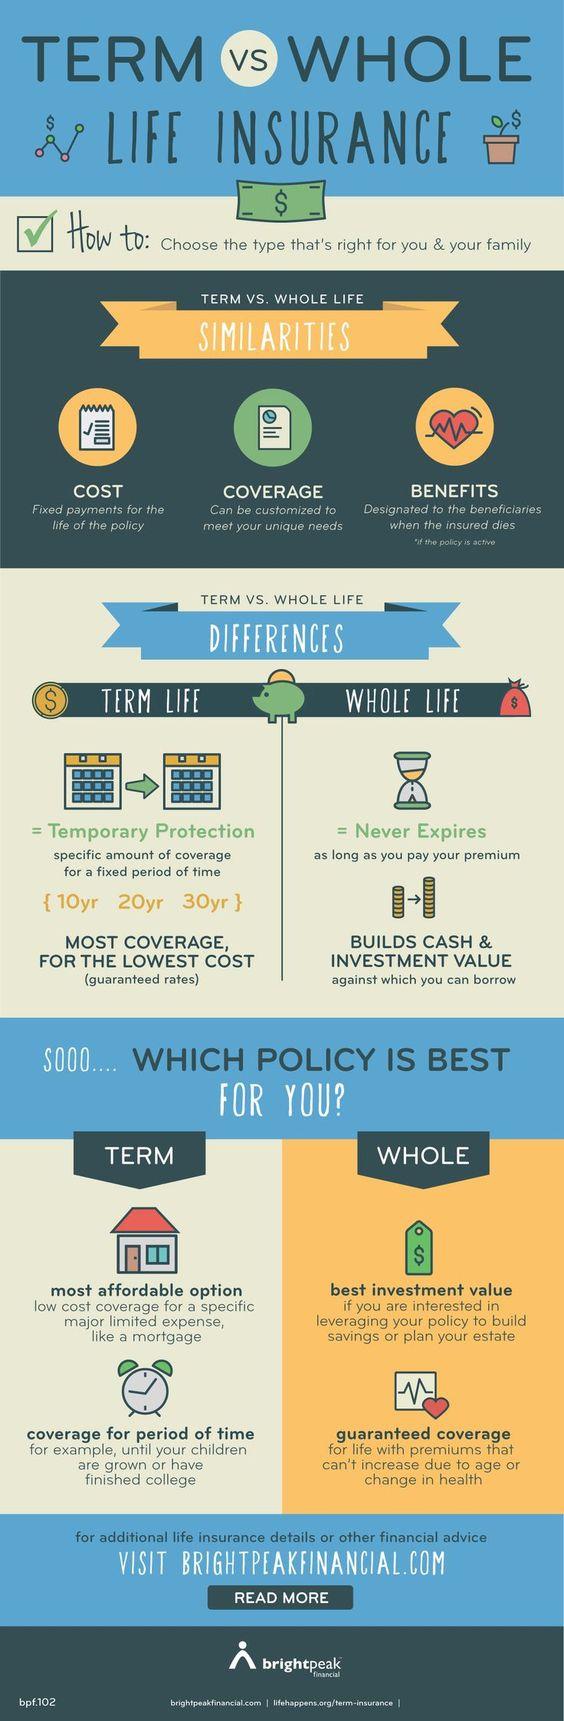 Whole Life Insurance Quote Comparison Term Life Insurance Vswhole Life Insurance  Life Insurance